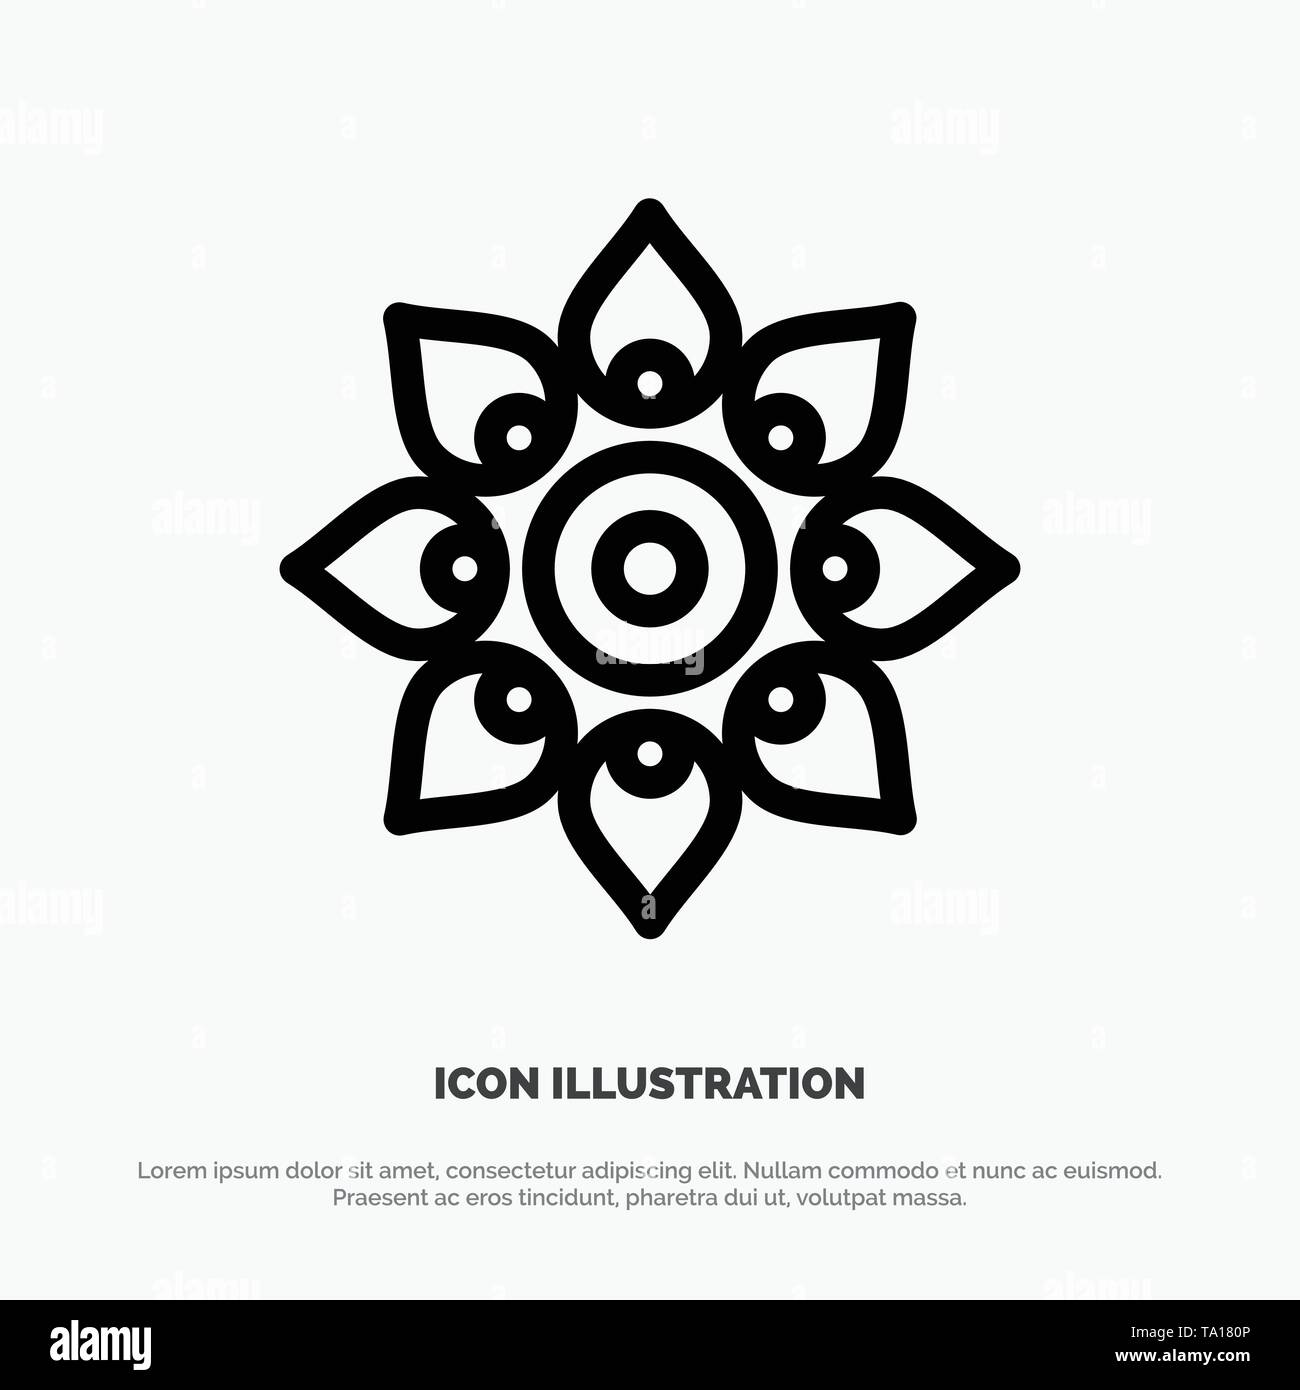 Celebrate, Decorate, Decoration, Diwali, Hindu, Holi Line Icon Vector - Stock Image